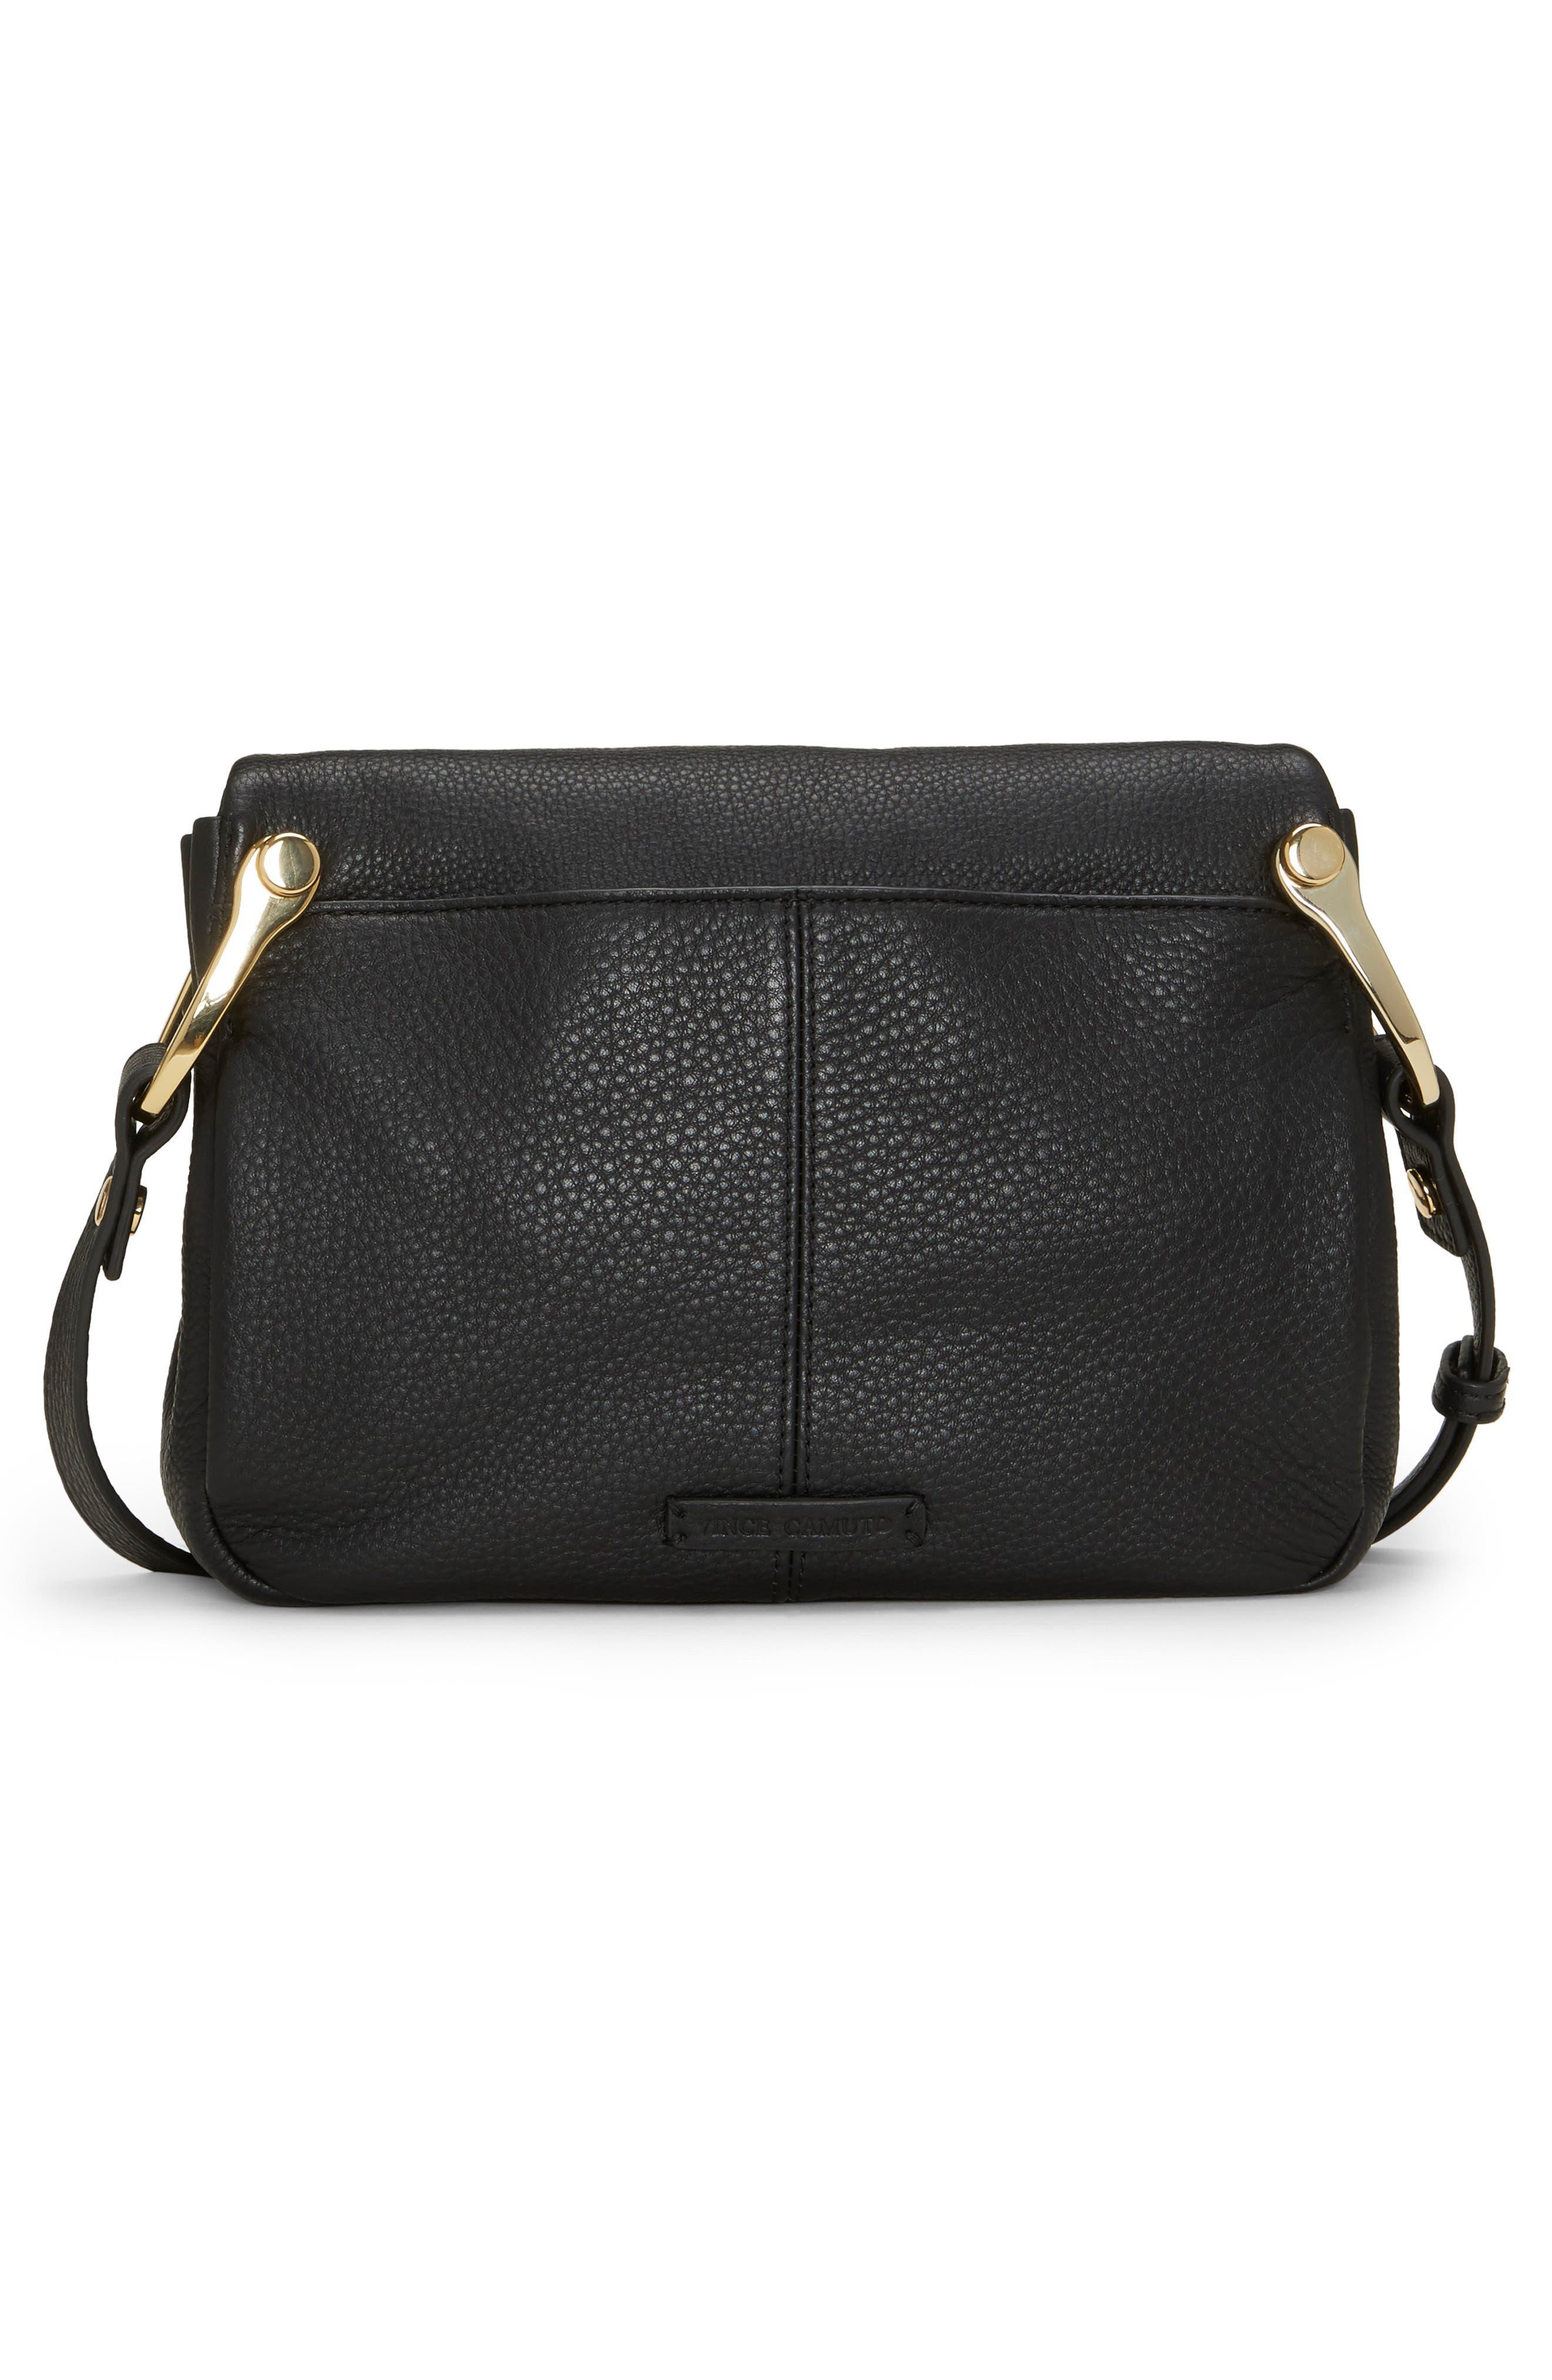 VINCE CAMUTO,                             Clem Leather Crossbody Bag,                             Alternate thumbnail 2, color,                             001